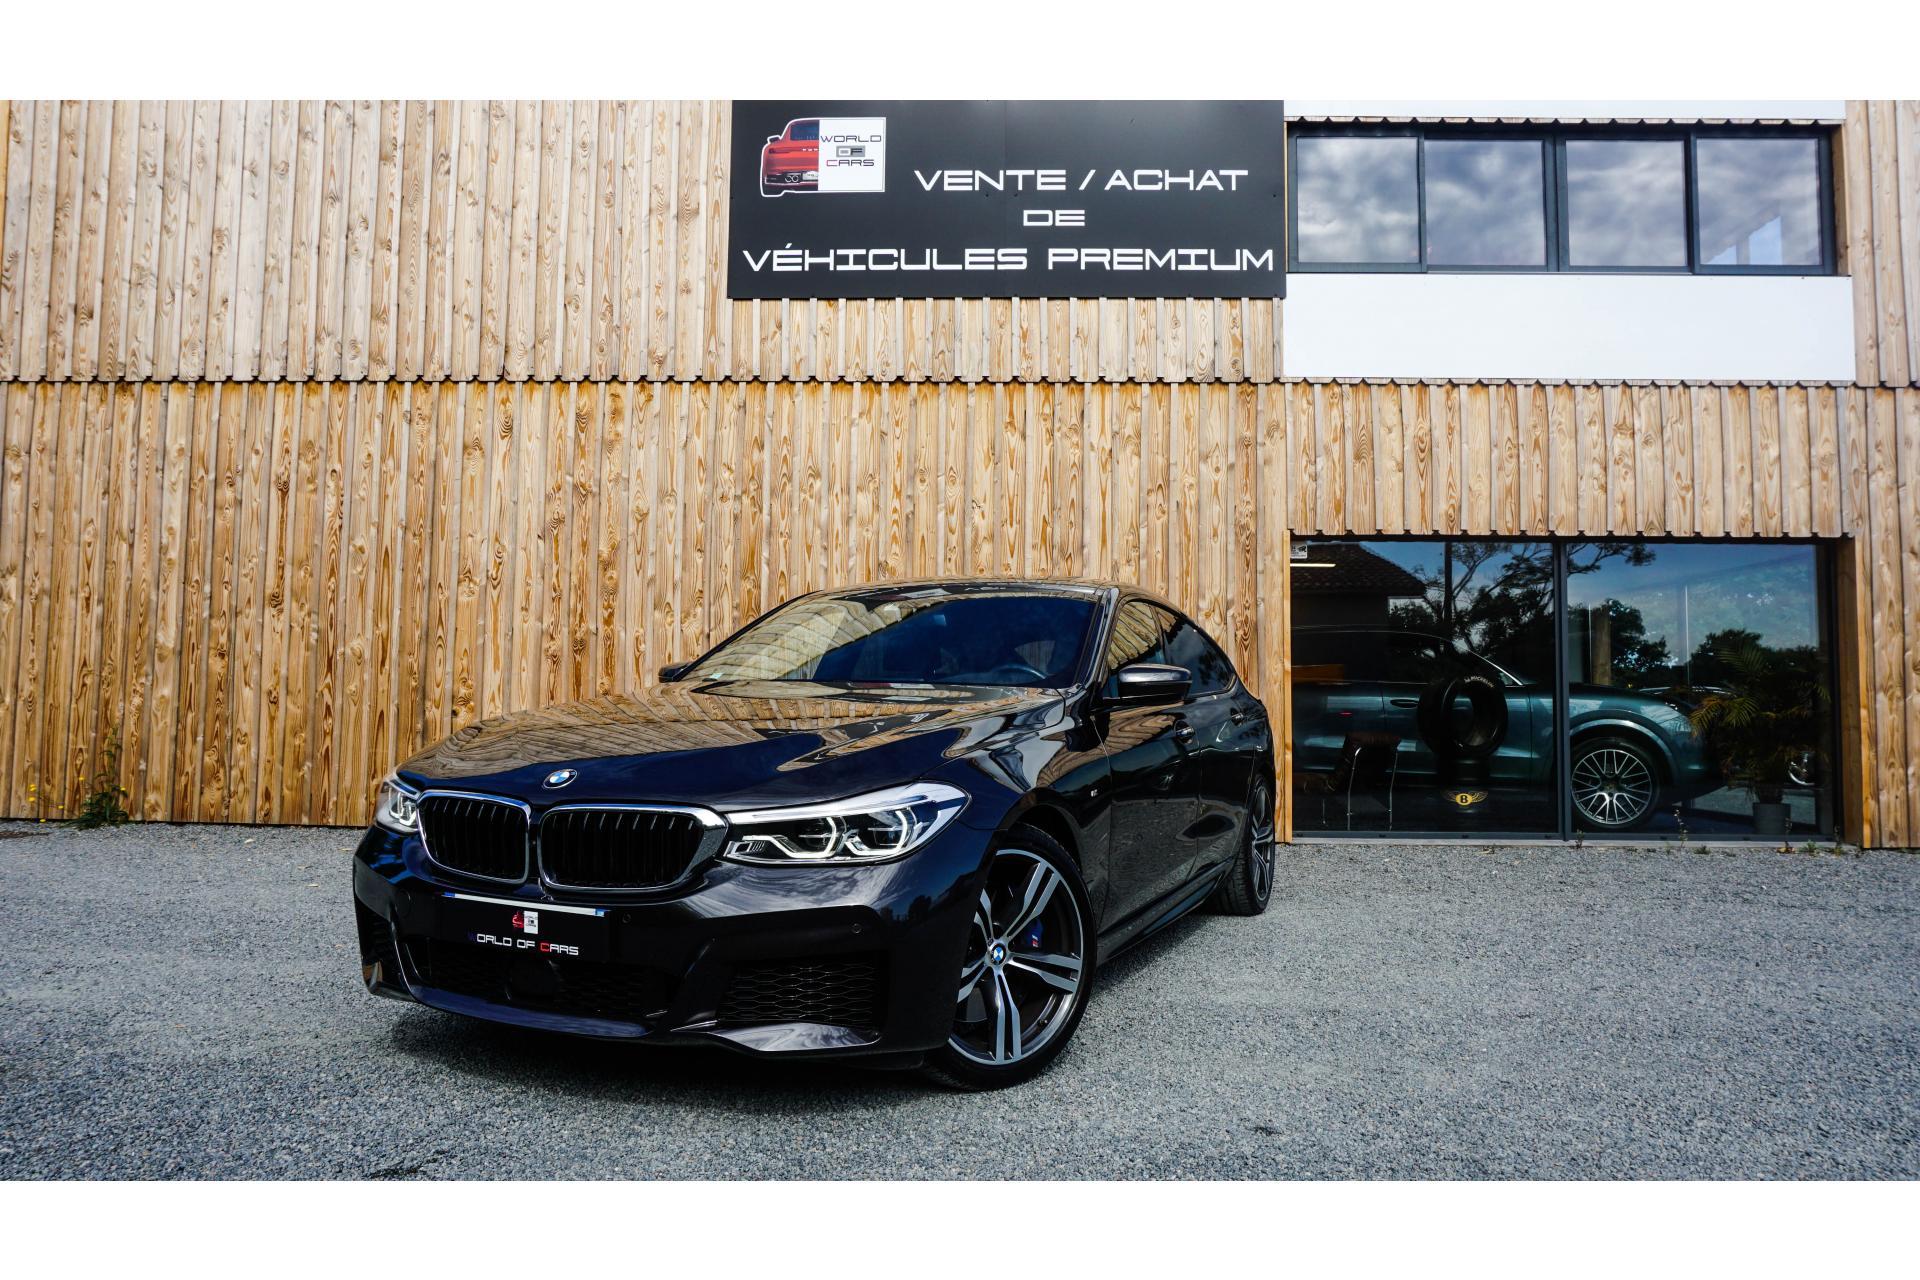 BMW-SERIE 6-630d xDrive Gran Turismo - BVA Sport  GRAN TURISMO G32 M Sport PHASE 1